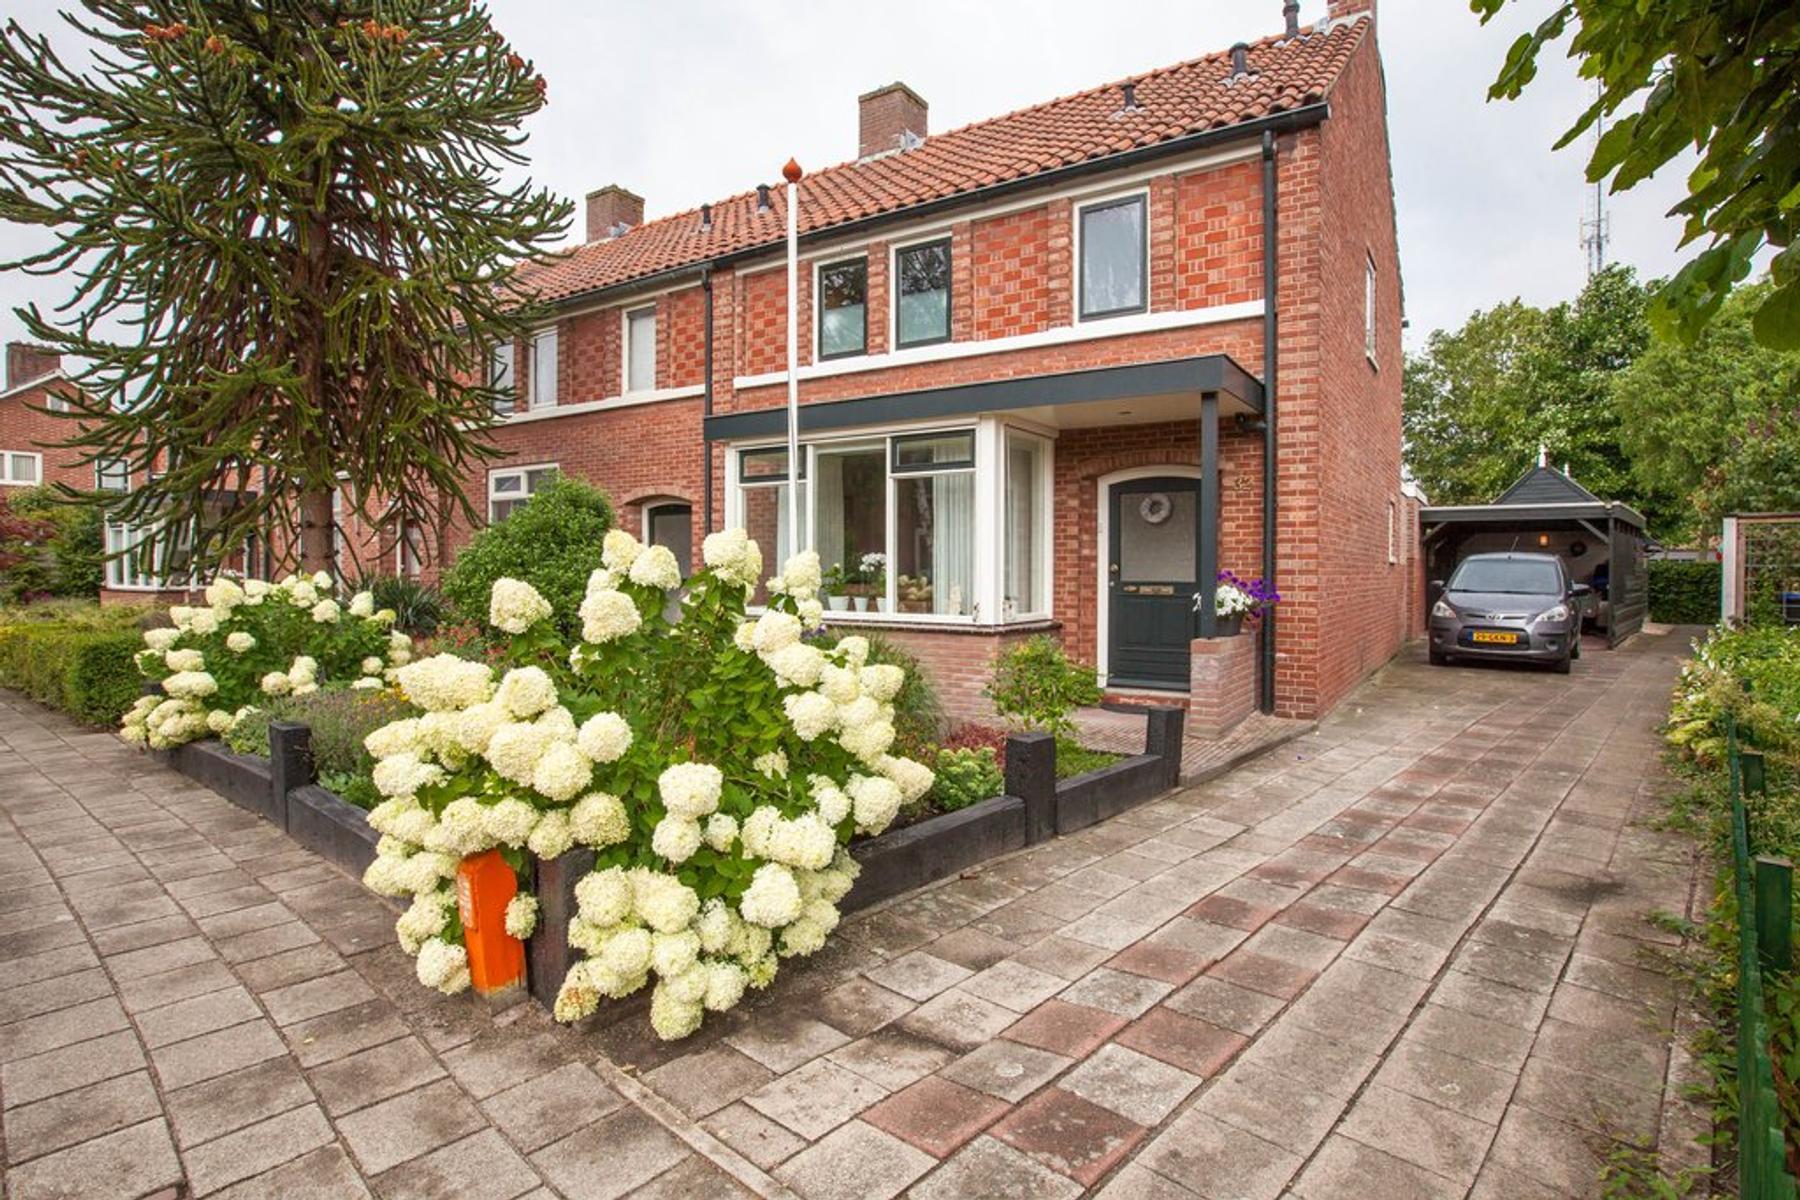 Scheringstraat 32 in Winterswijk 7101 HD